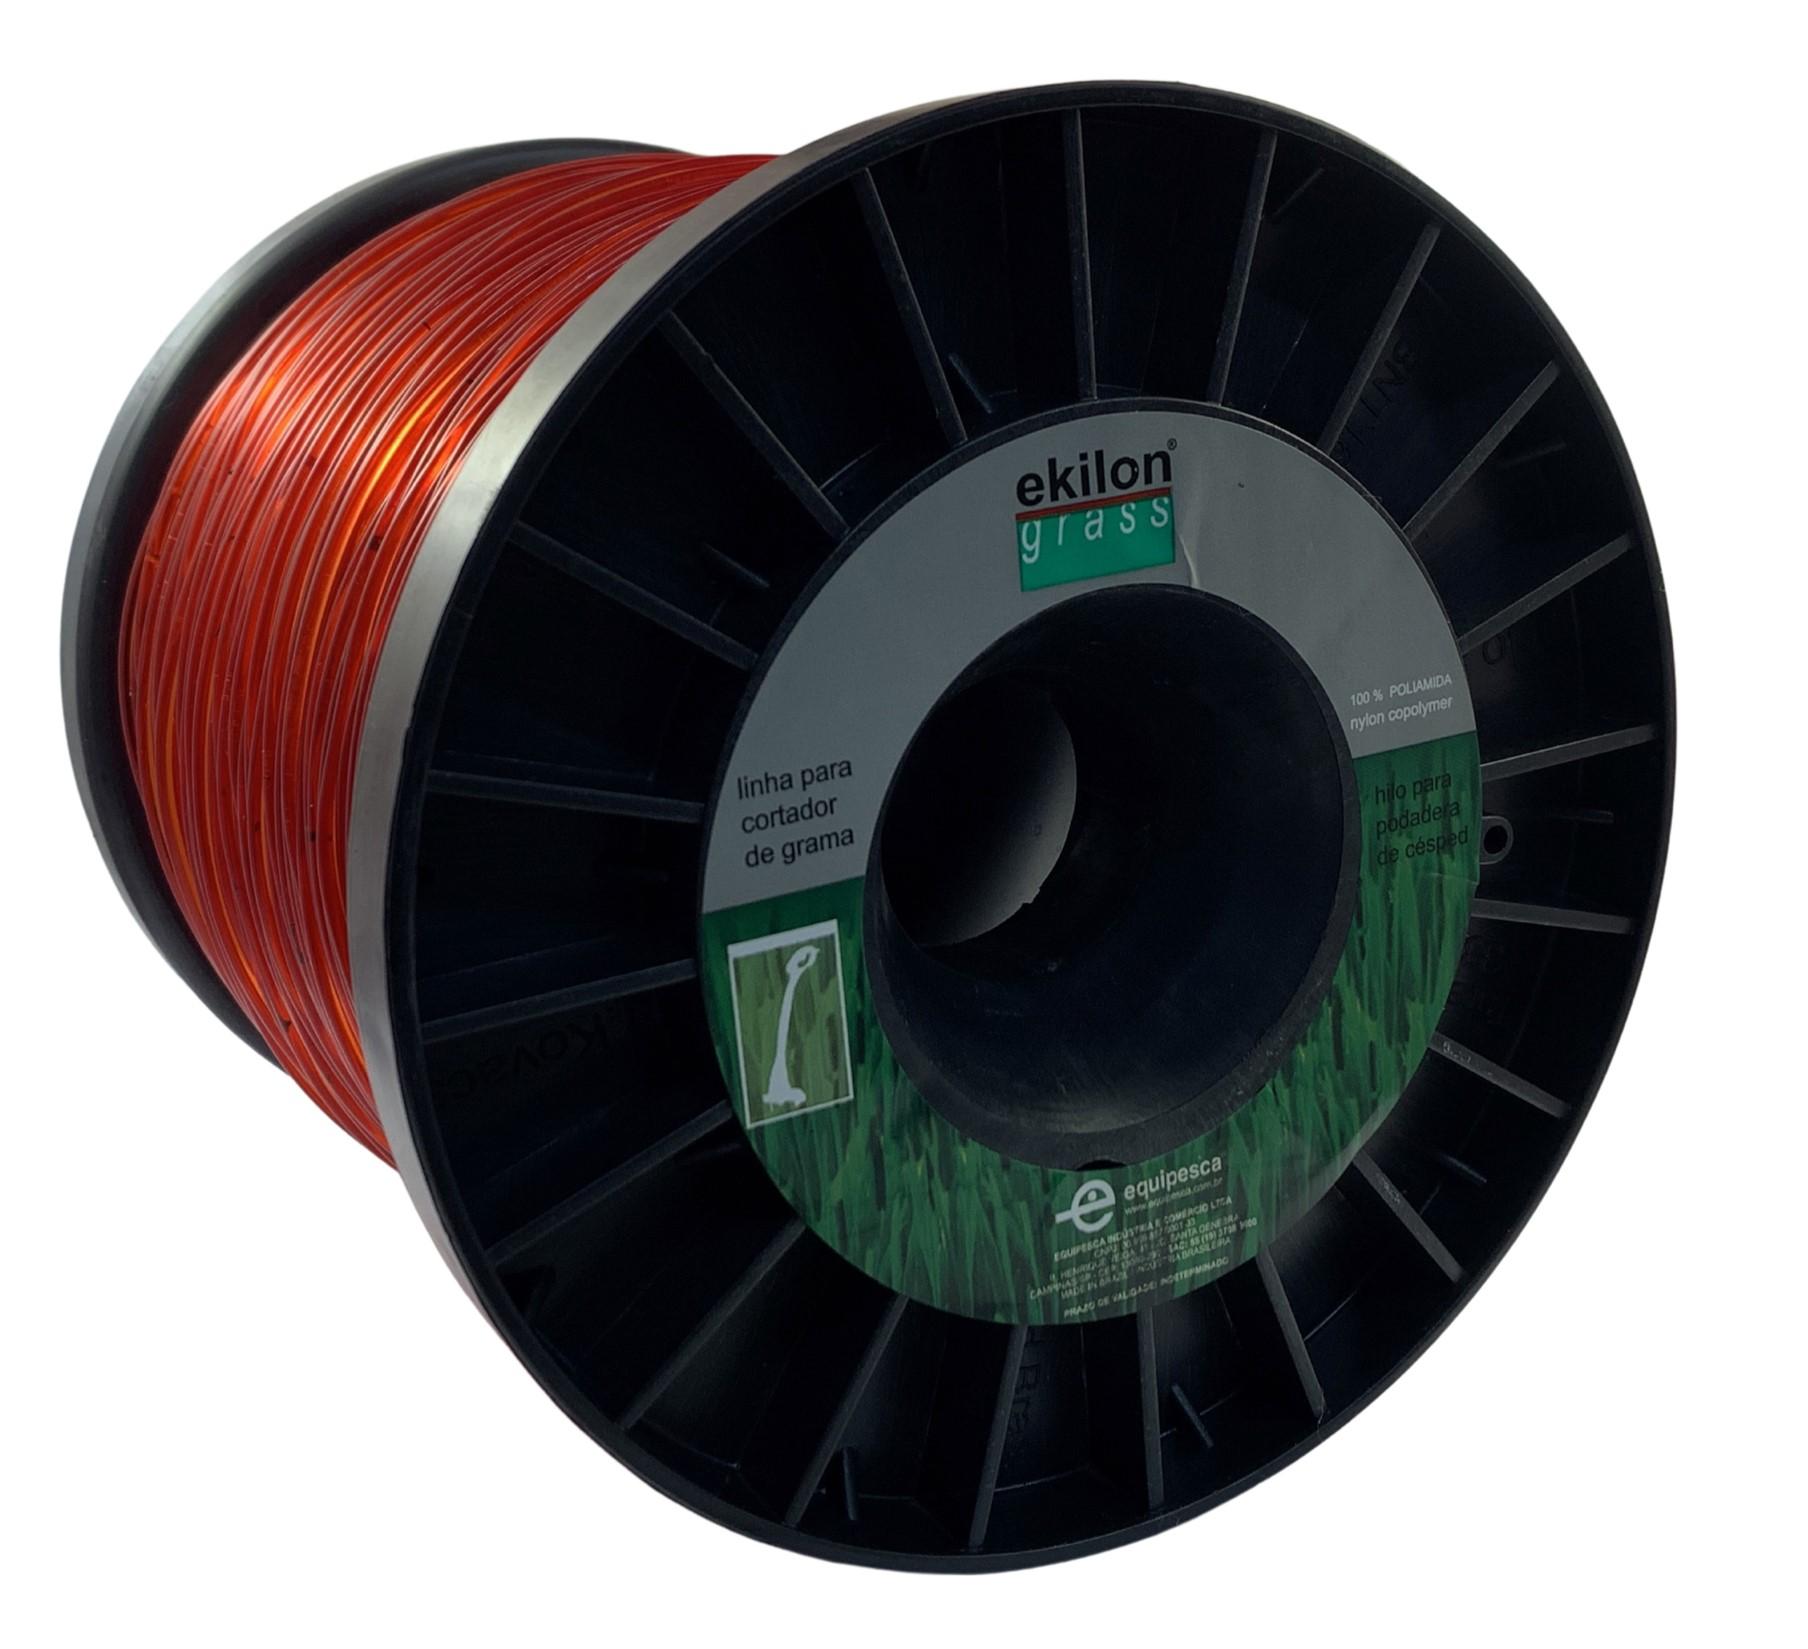 Fio De Nylon Vermelho 2mm Ekilon® Grass - 1 Kilo